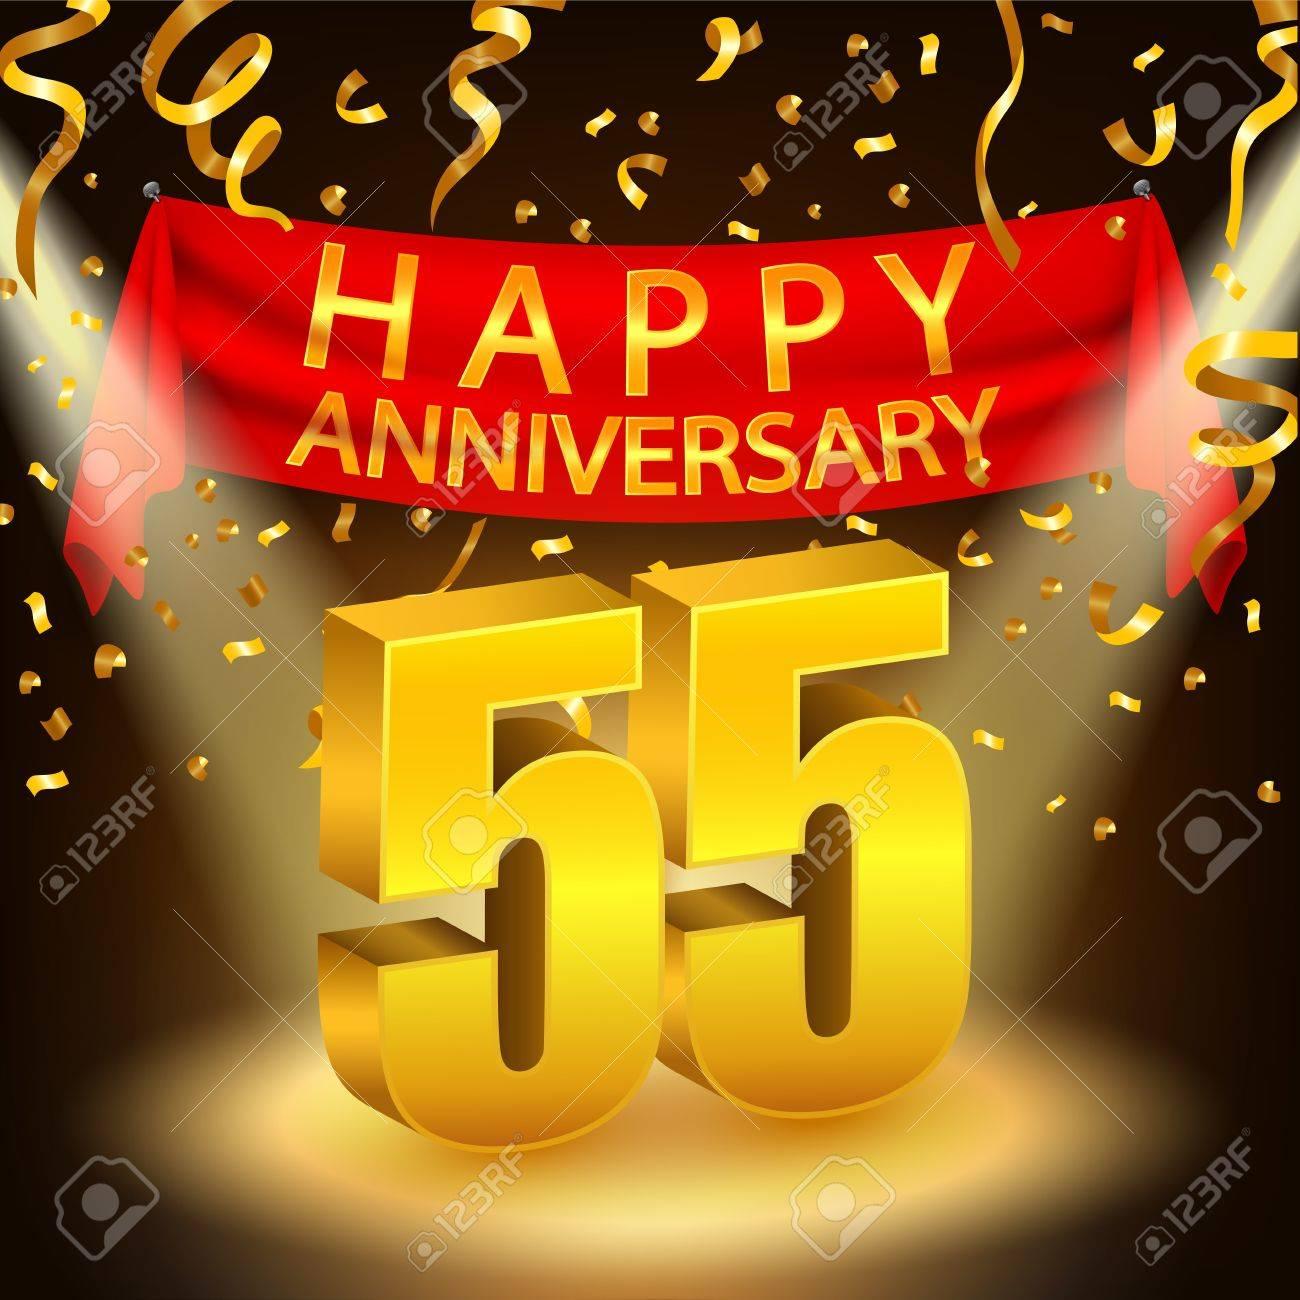 Happy 55th Anniversary Celebration With Golden Confetti And Spotlight Stock Vector